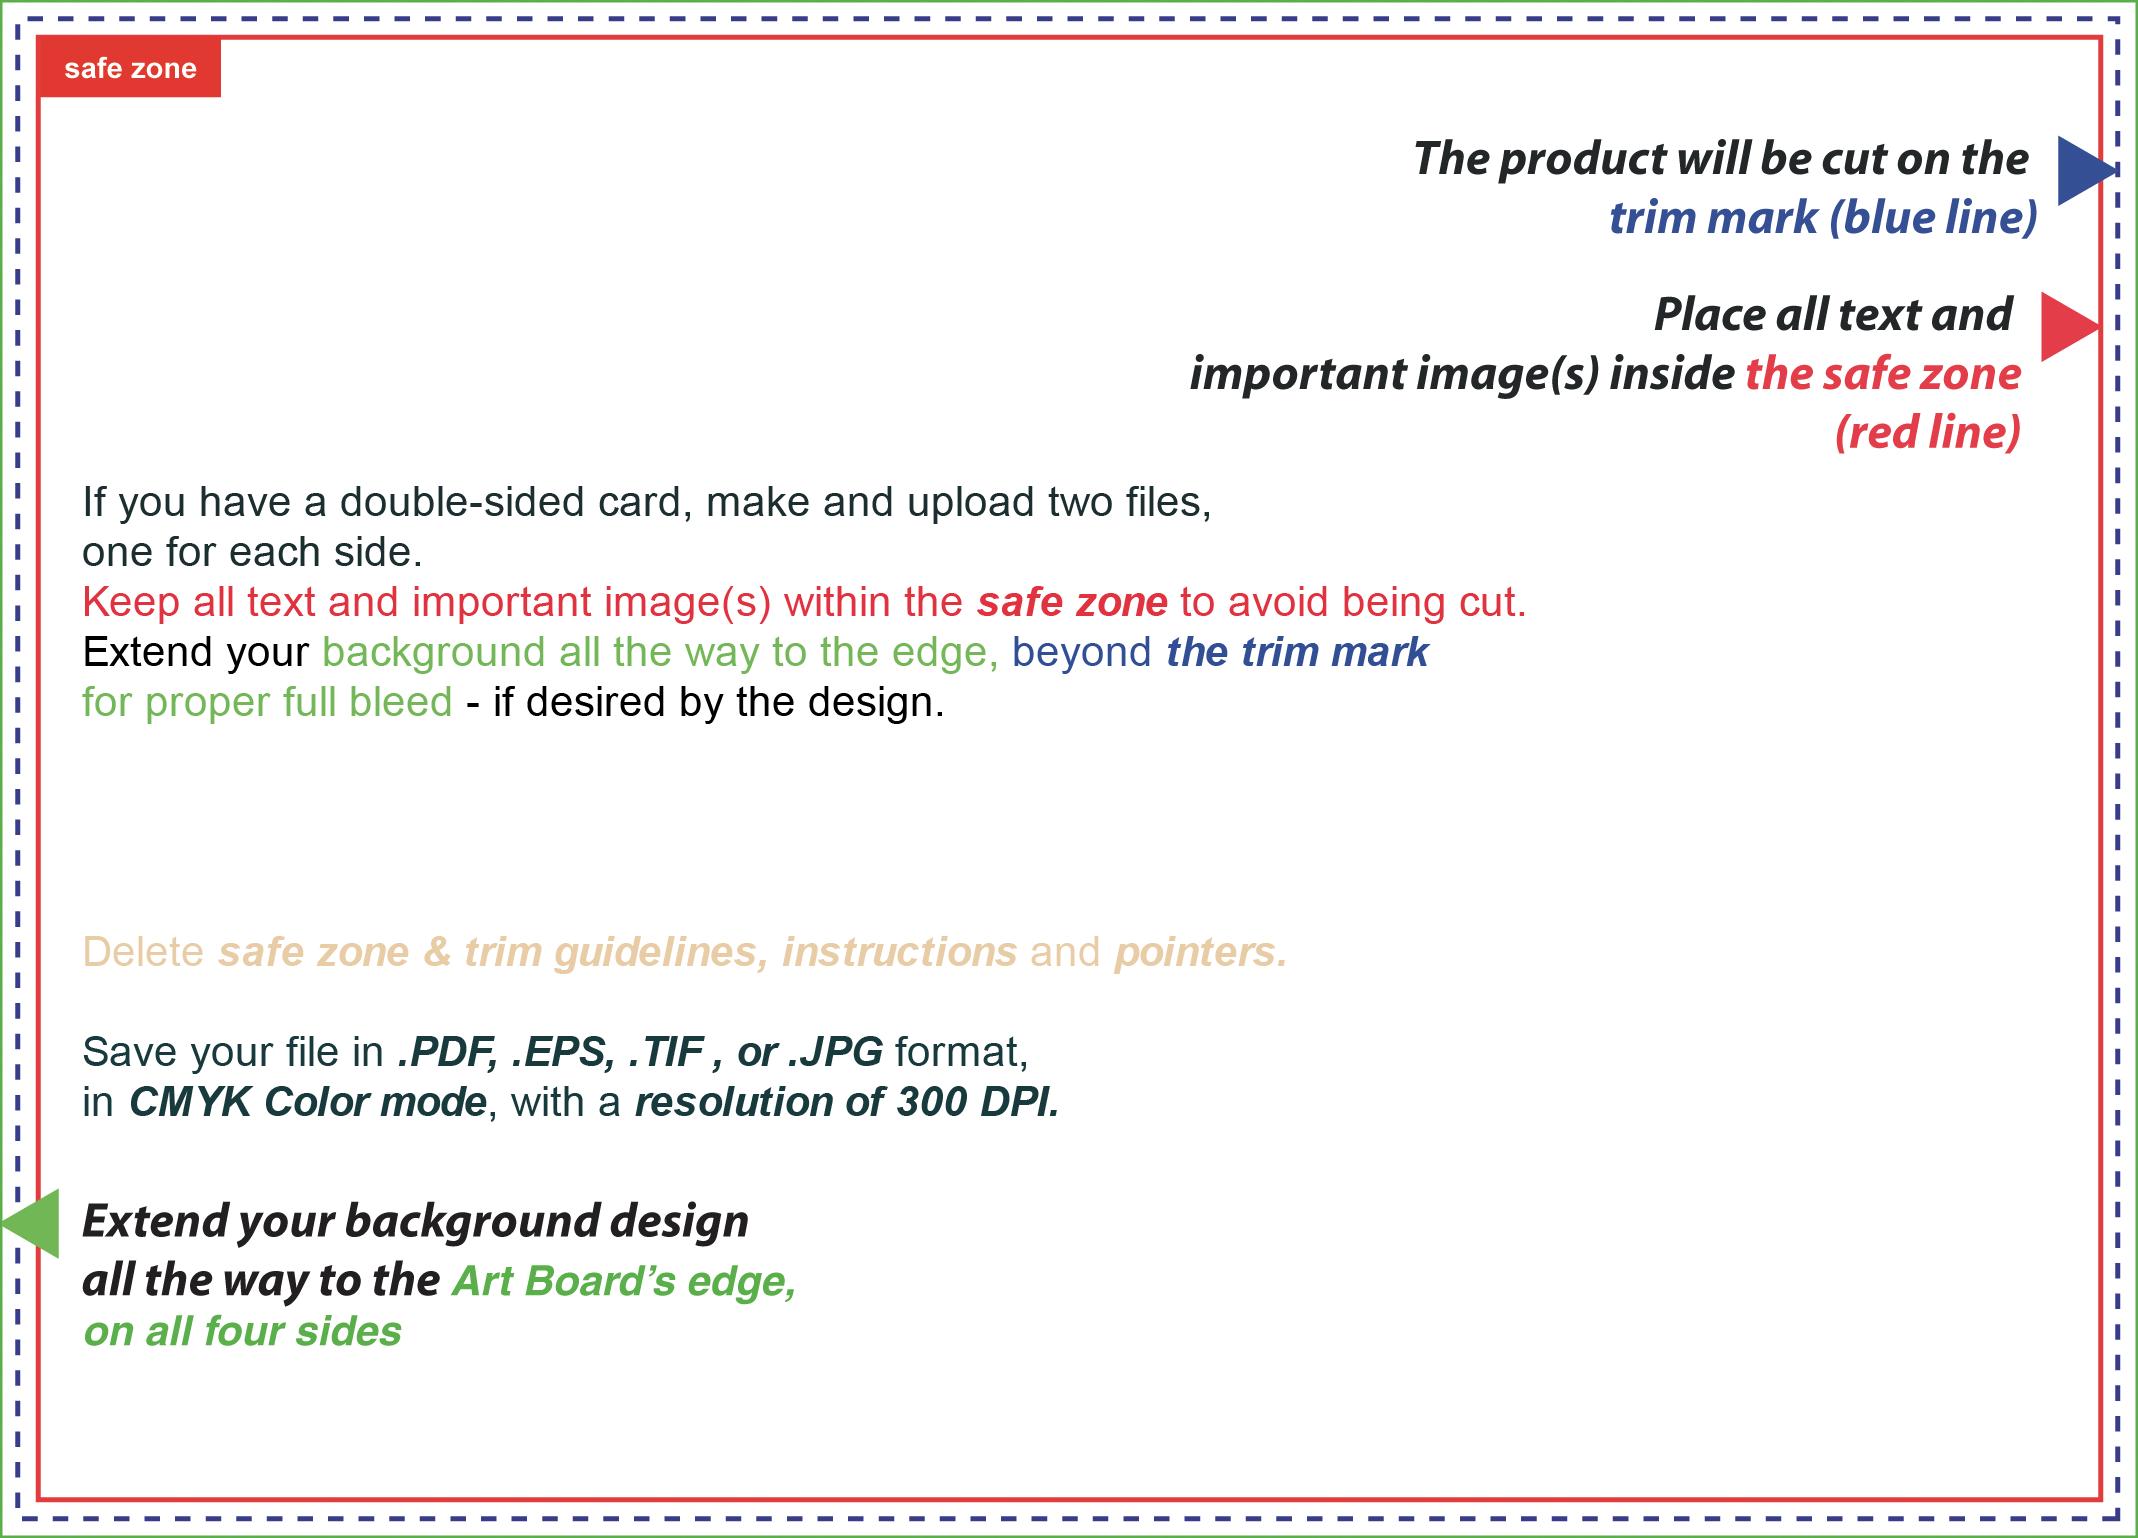 24 Creative 5 X 7 Postcard Template Microsoft Word for Ms Word by 5 X 7 Postcard Template Microsoft Word